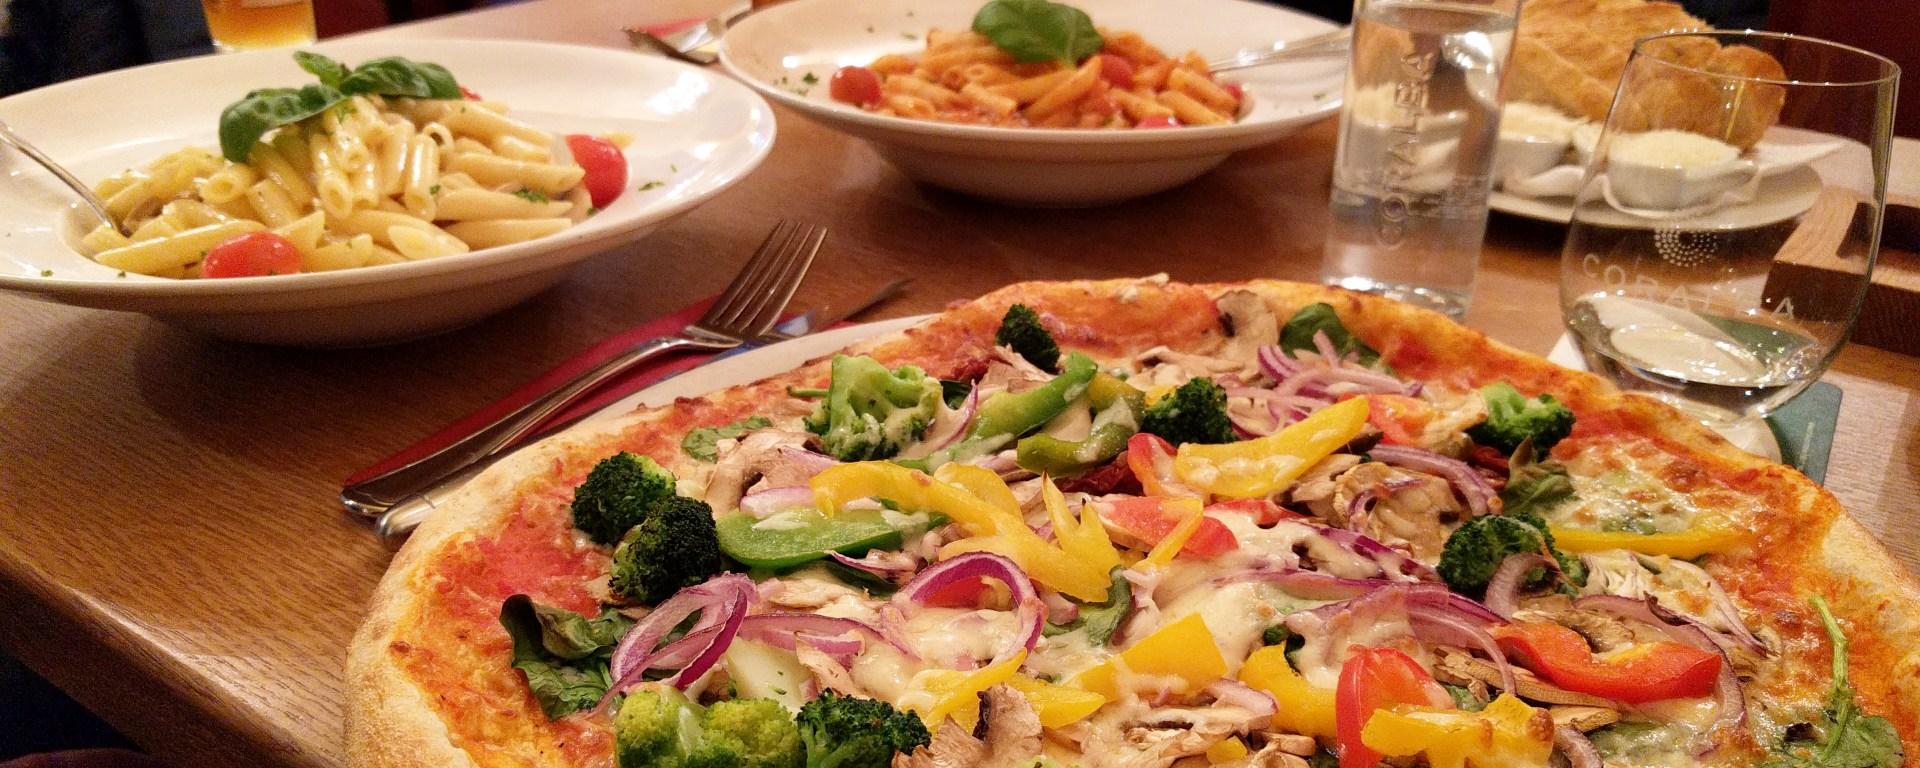 Pizza de la Casa im l´Oliveto